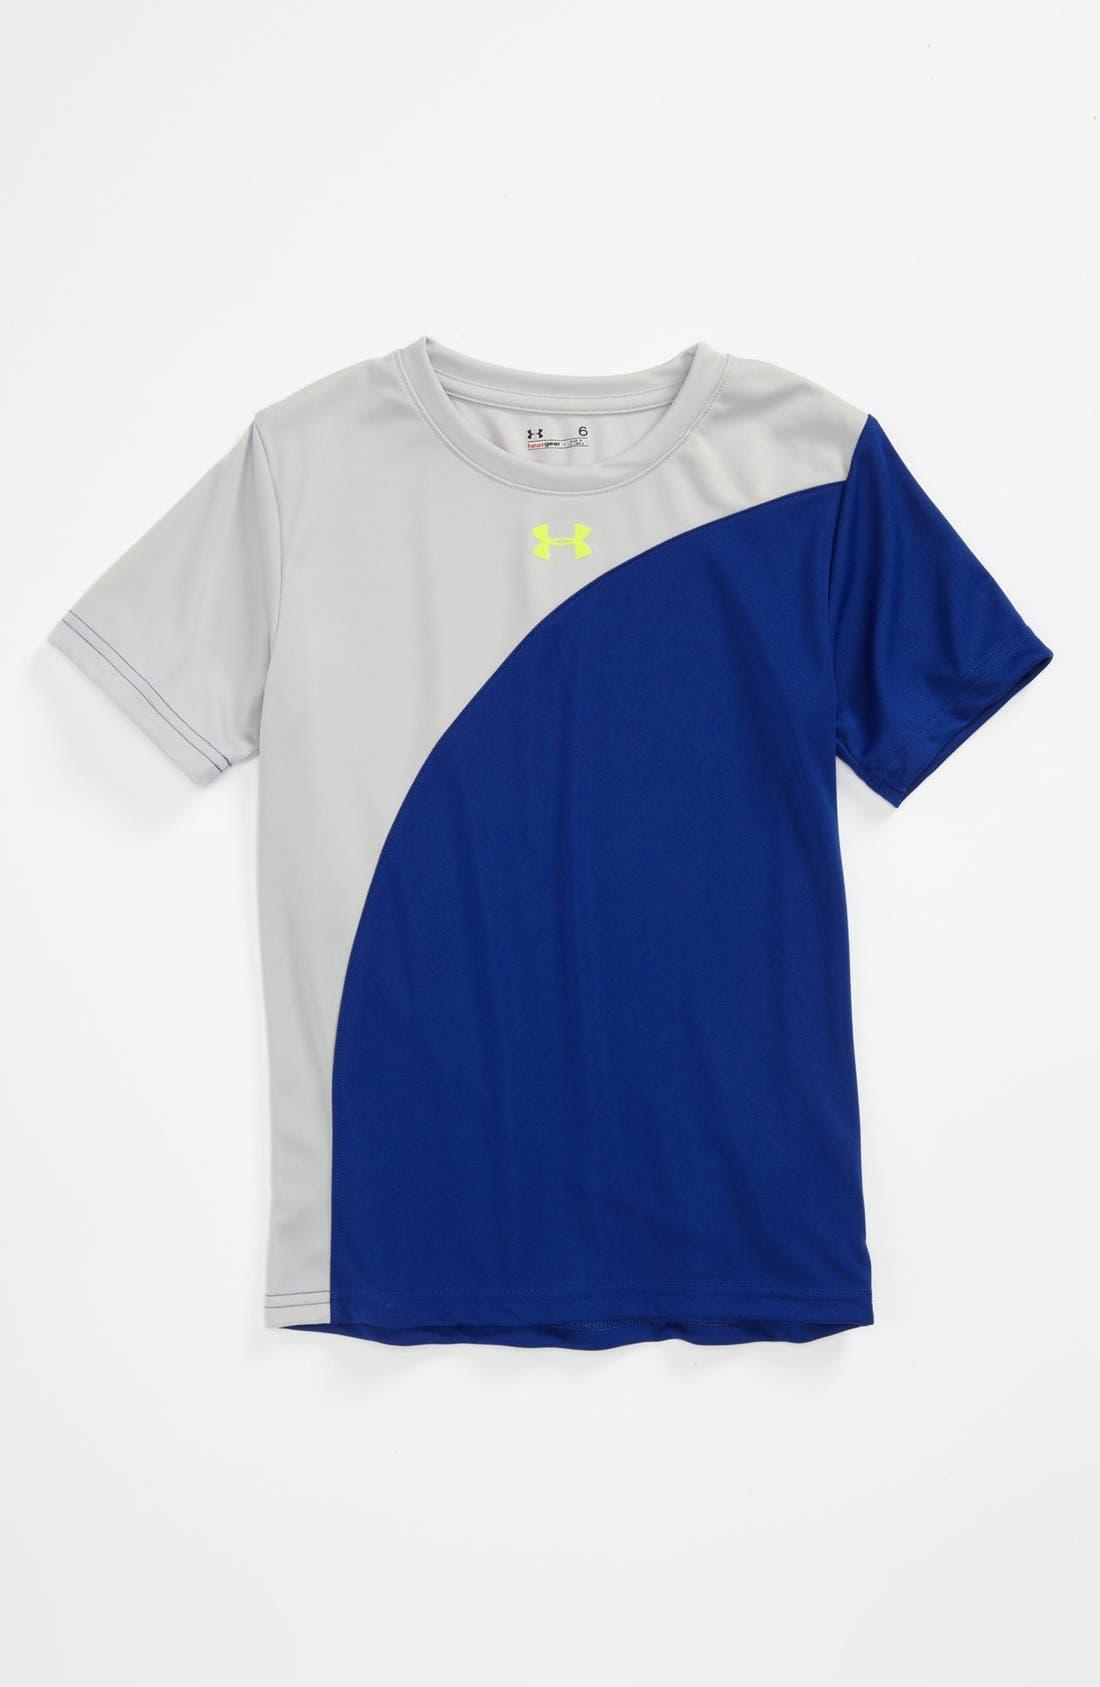 Alternate Image 1 Selected - Under Armour 'Flip' HeatGear® T-Shirt (Little Boys)